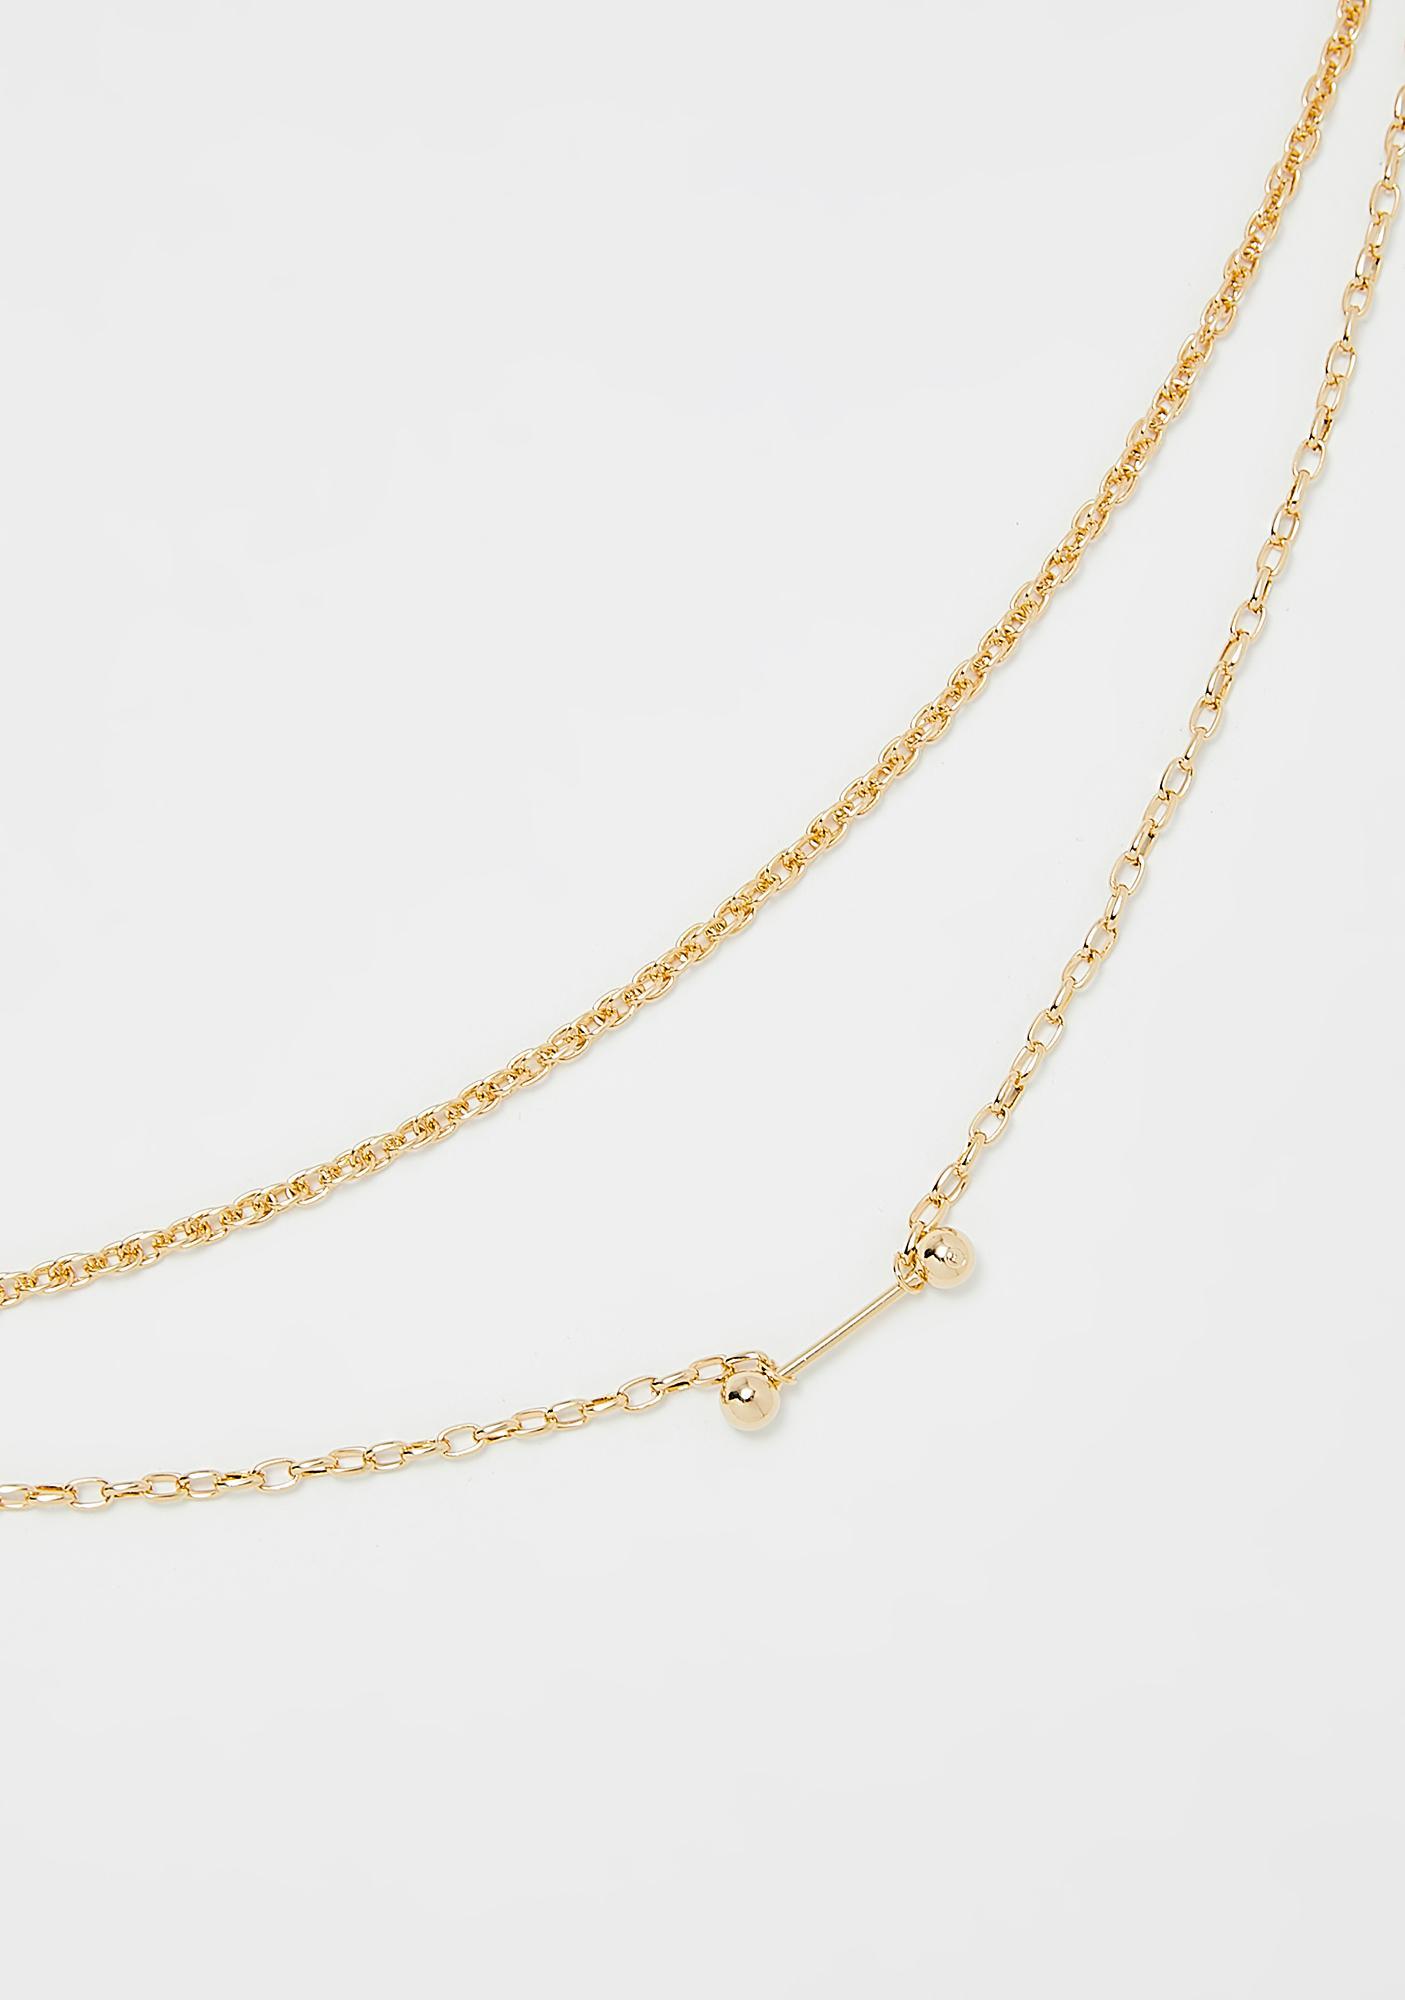 Raise The Bar Chain Necklace